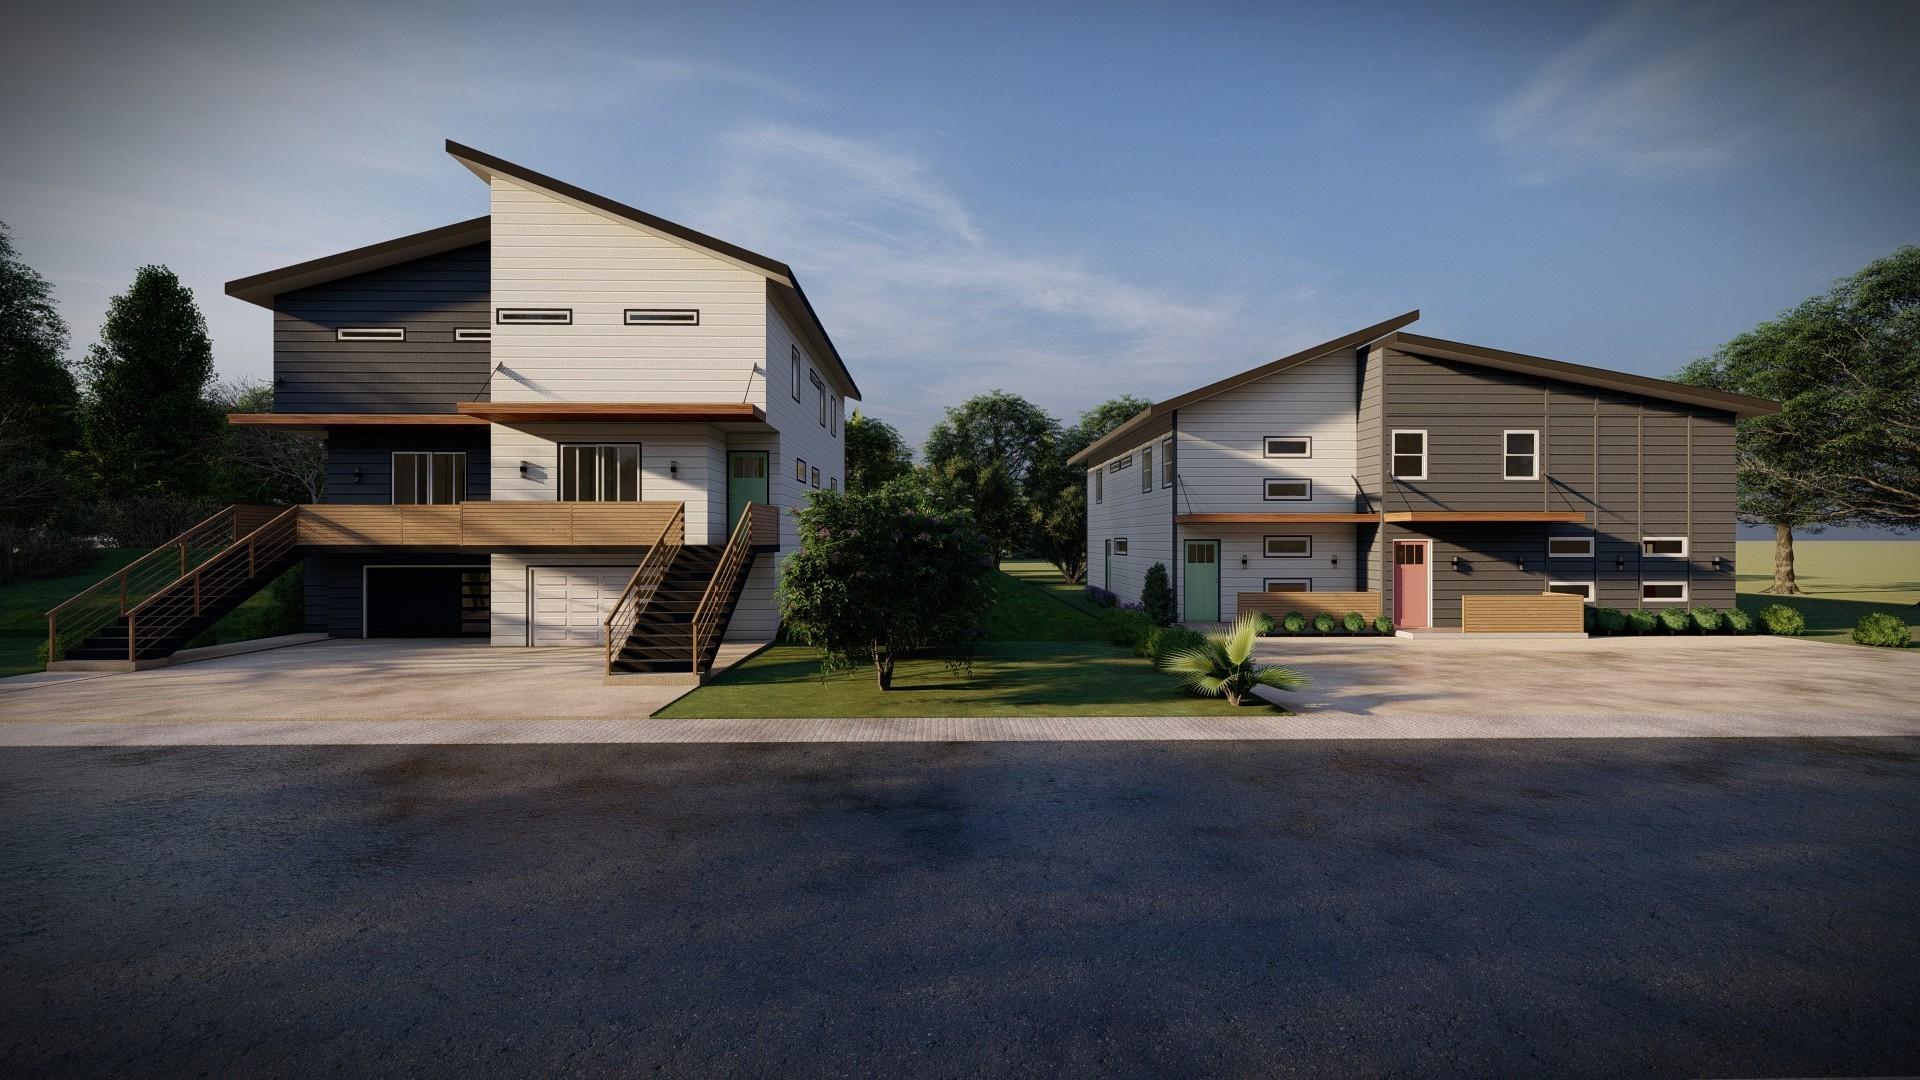 2306 Lloyd Ave #B Property Photo - Nashville, TN real estate listing